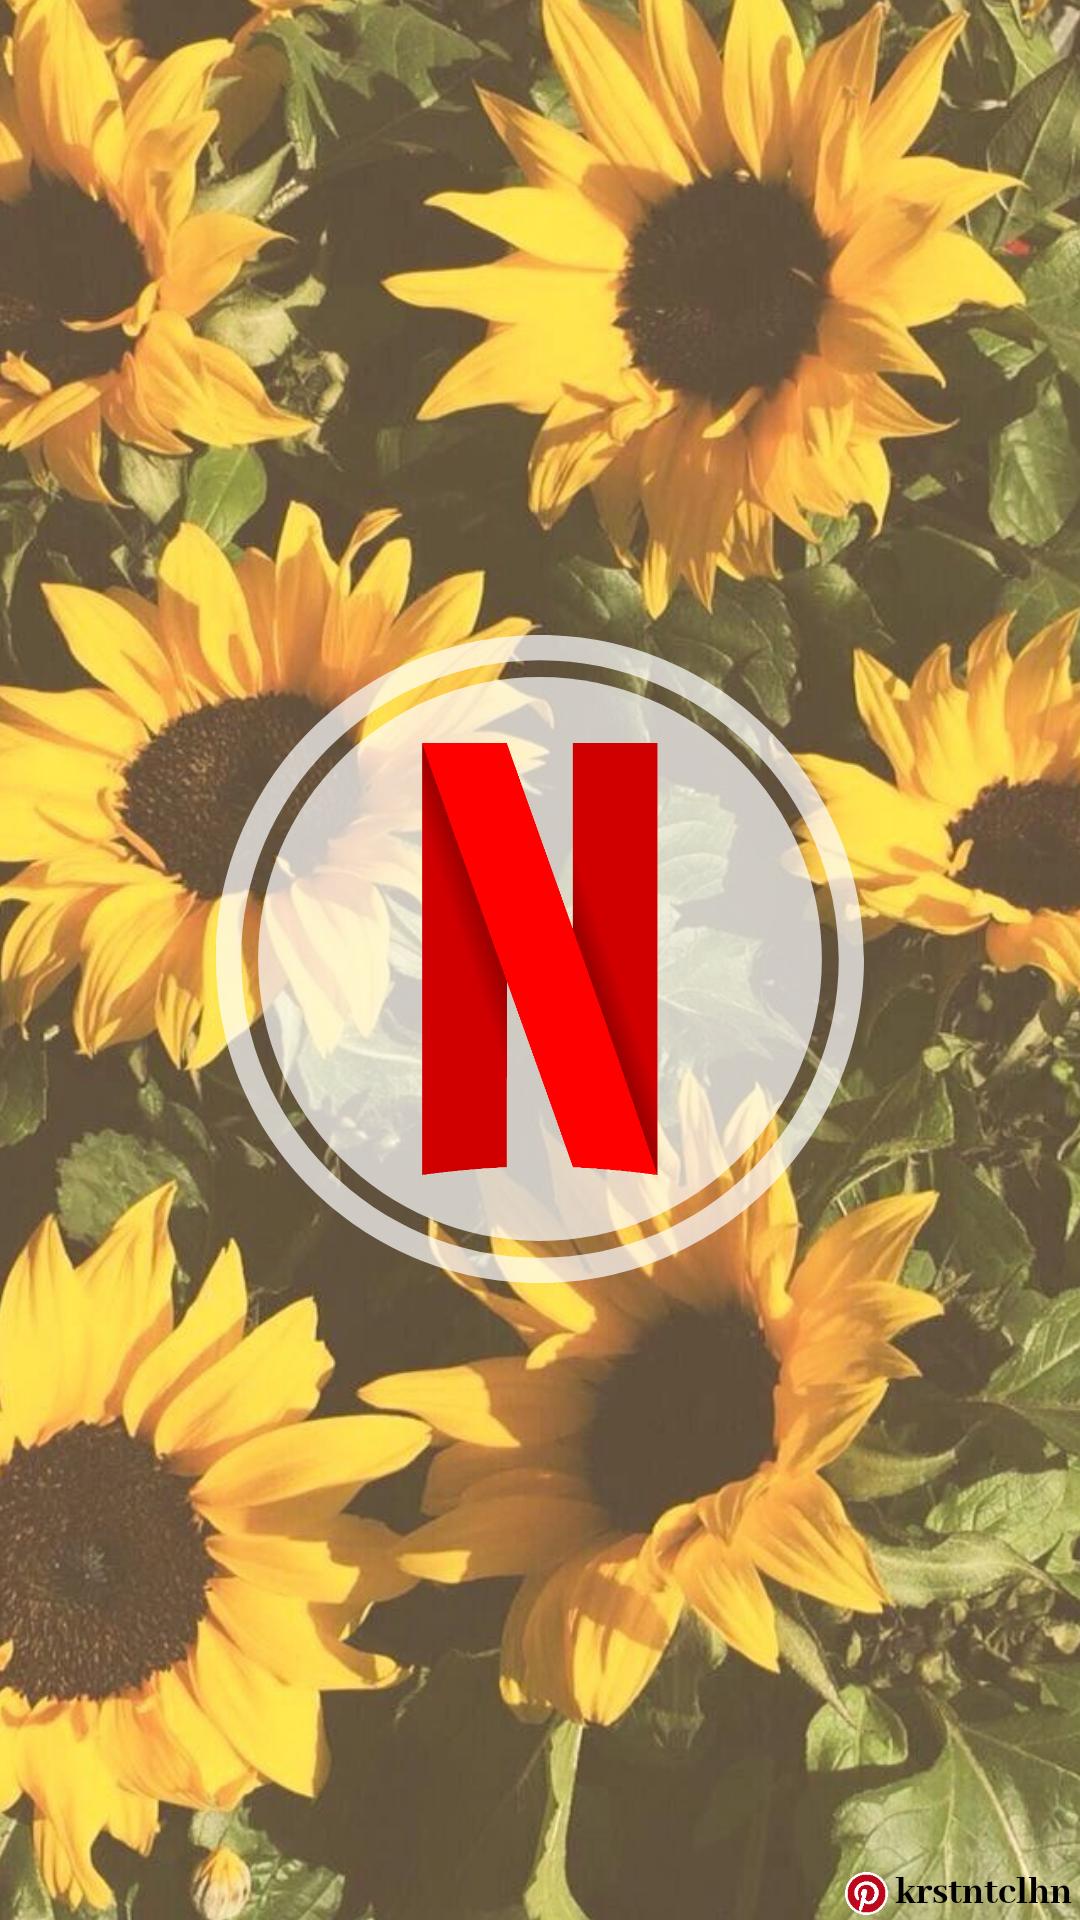 Netflix Ícone de gato, Ideias instagram, Ícones de